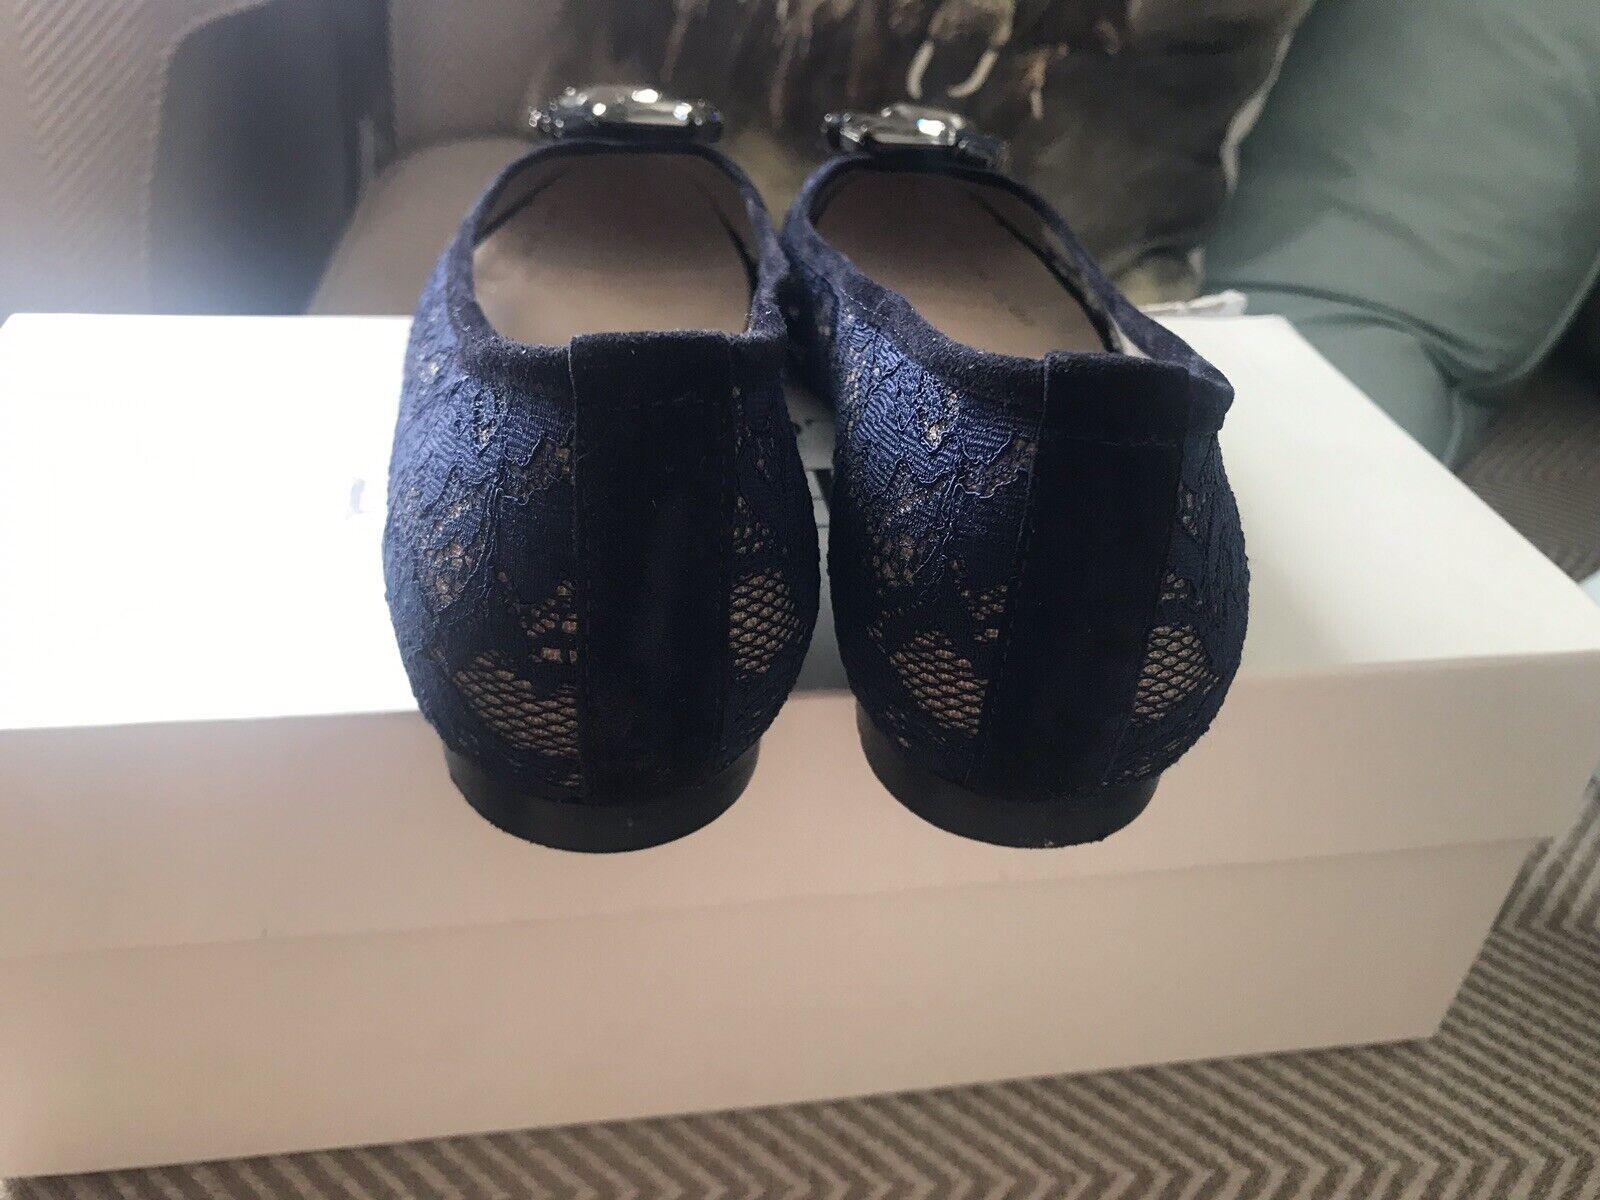 58ef7f843b59f L.K. Bennett Jessica Jewelled Lace Pumps Ballerina Flat Shoes in Navy size  37 (4 | eBay